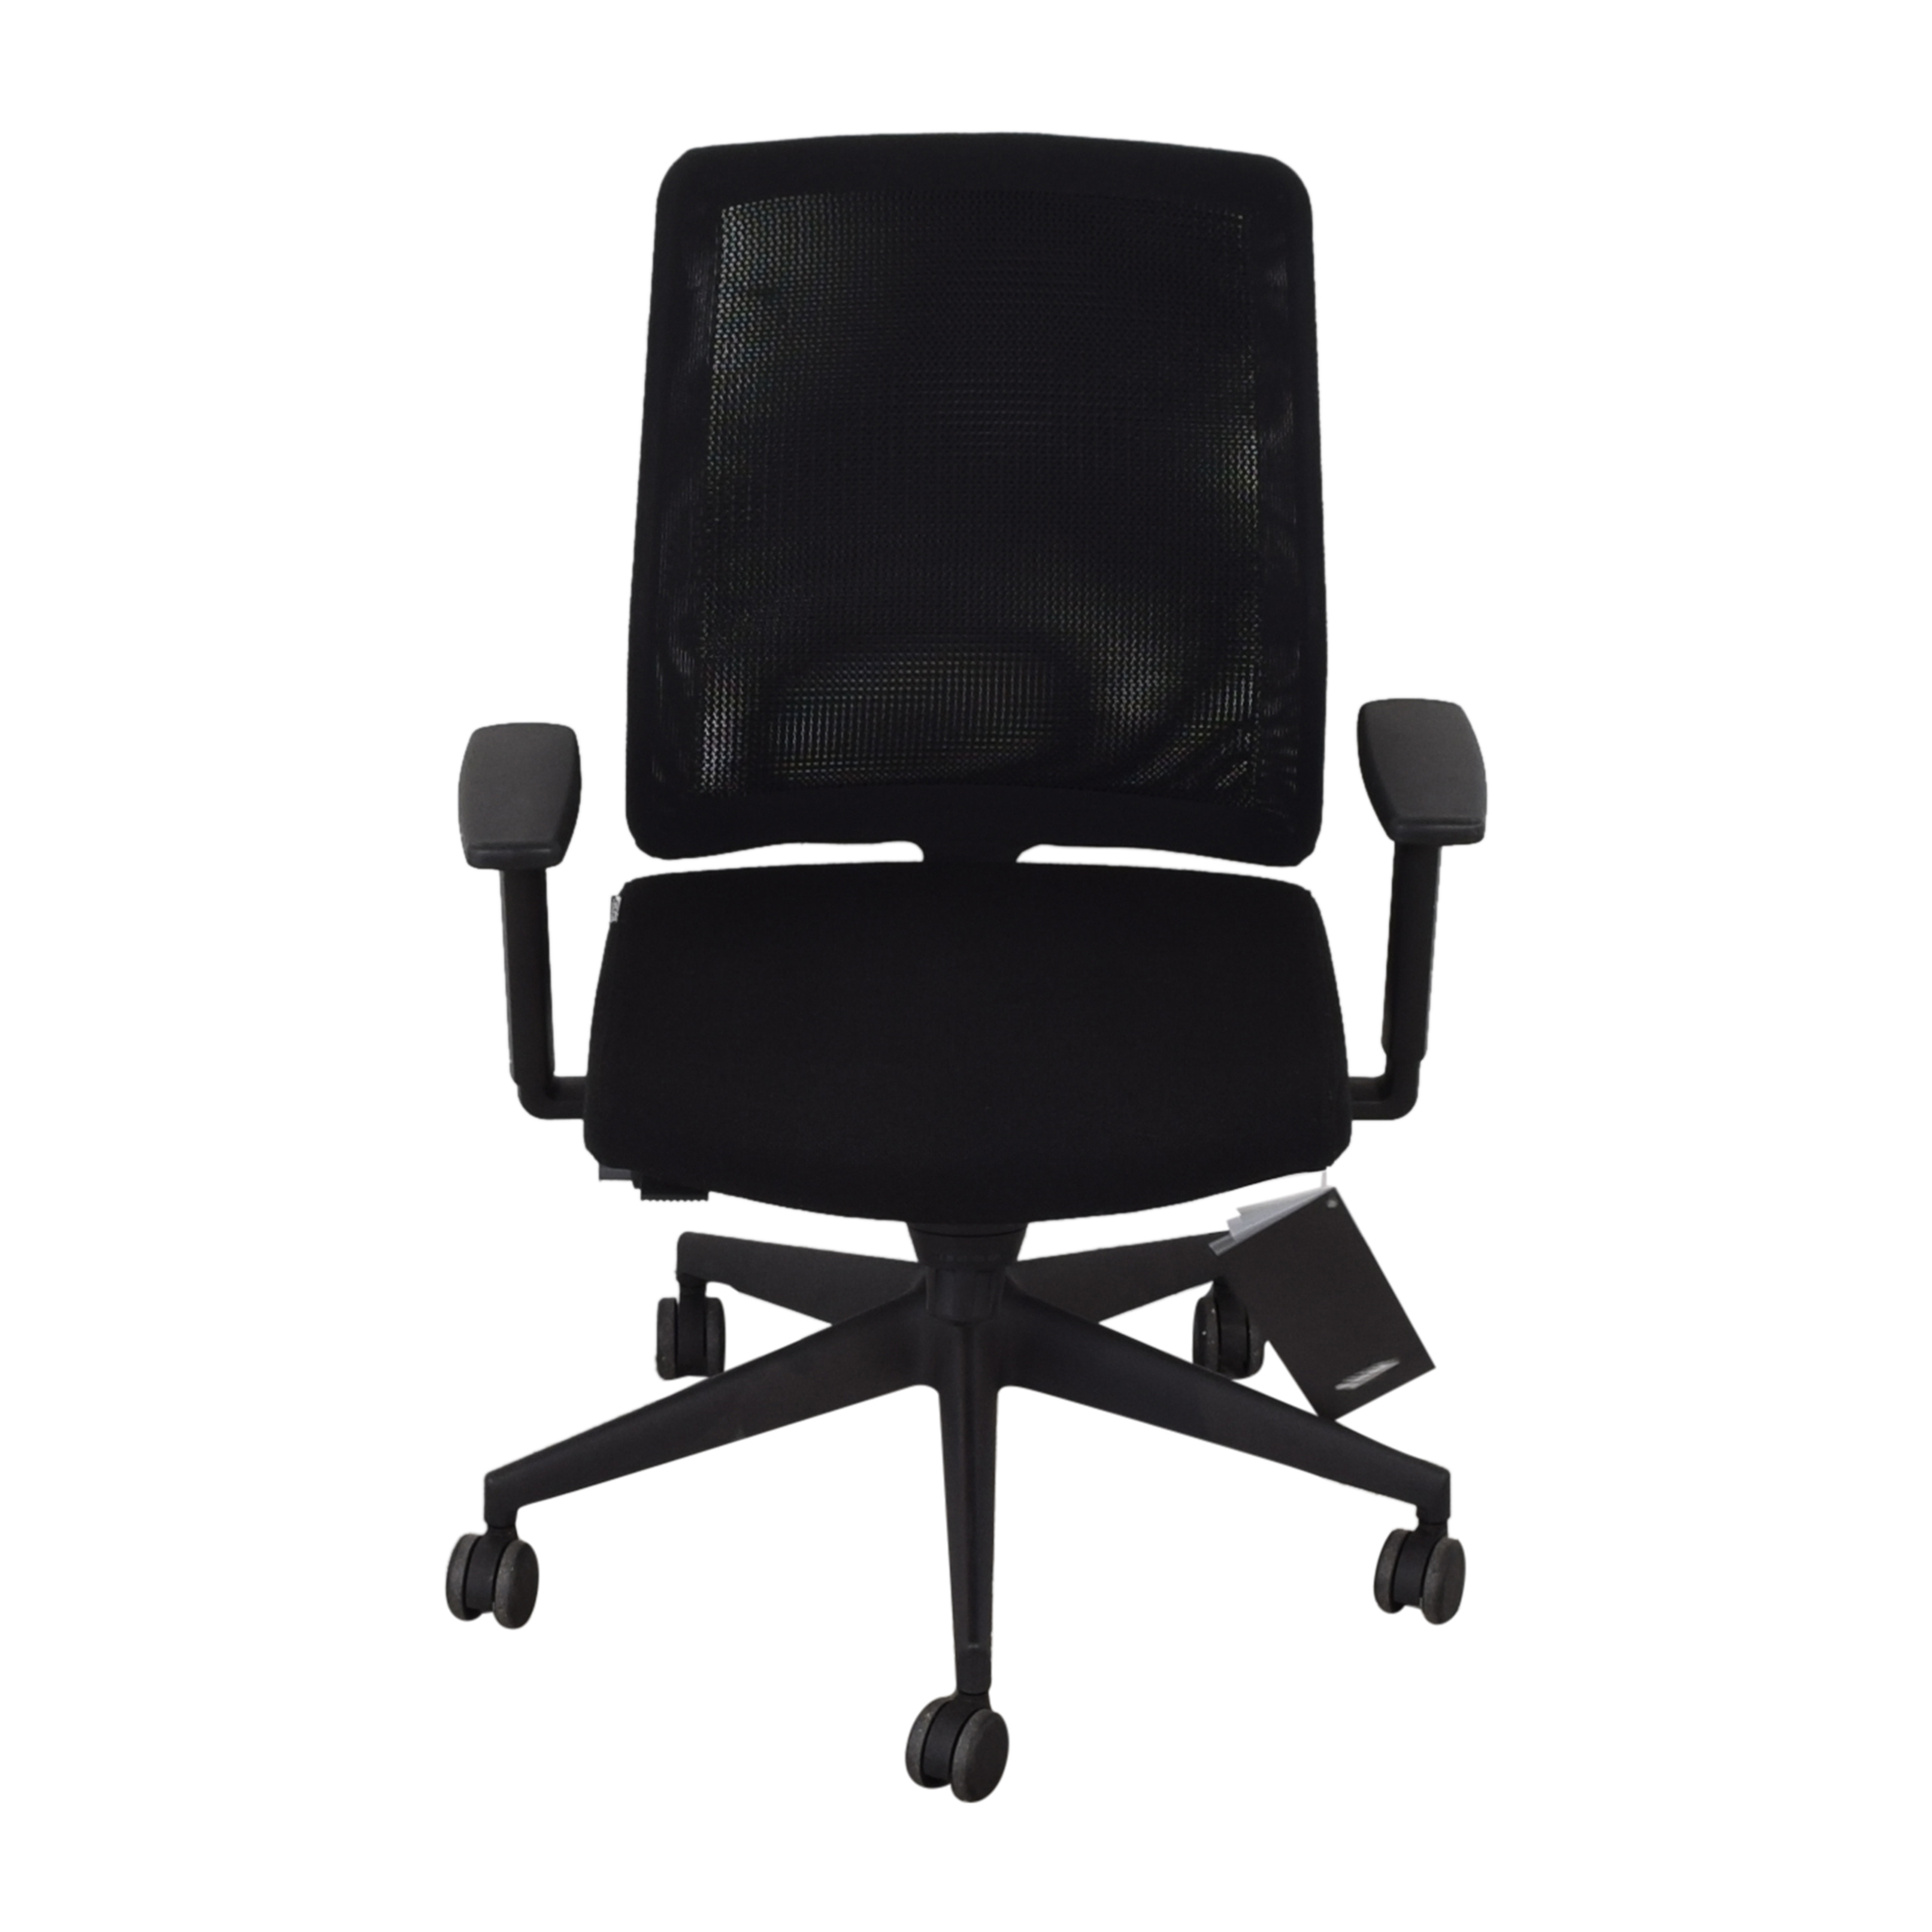 Koleksiyon Koleksiyon Dastan Operational Chair second hand